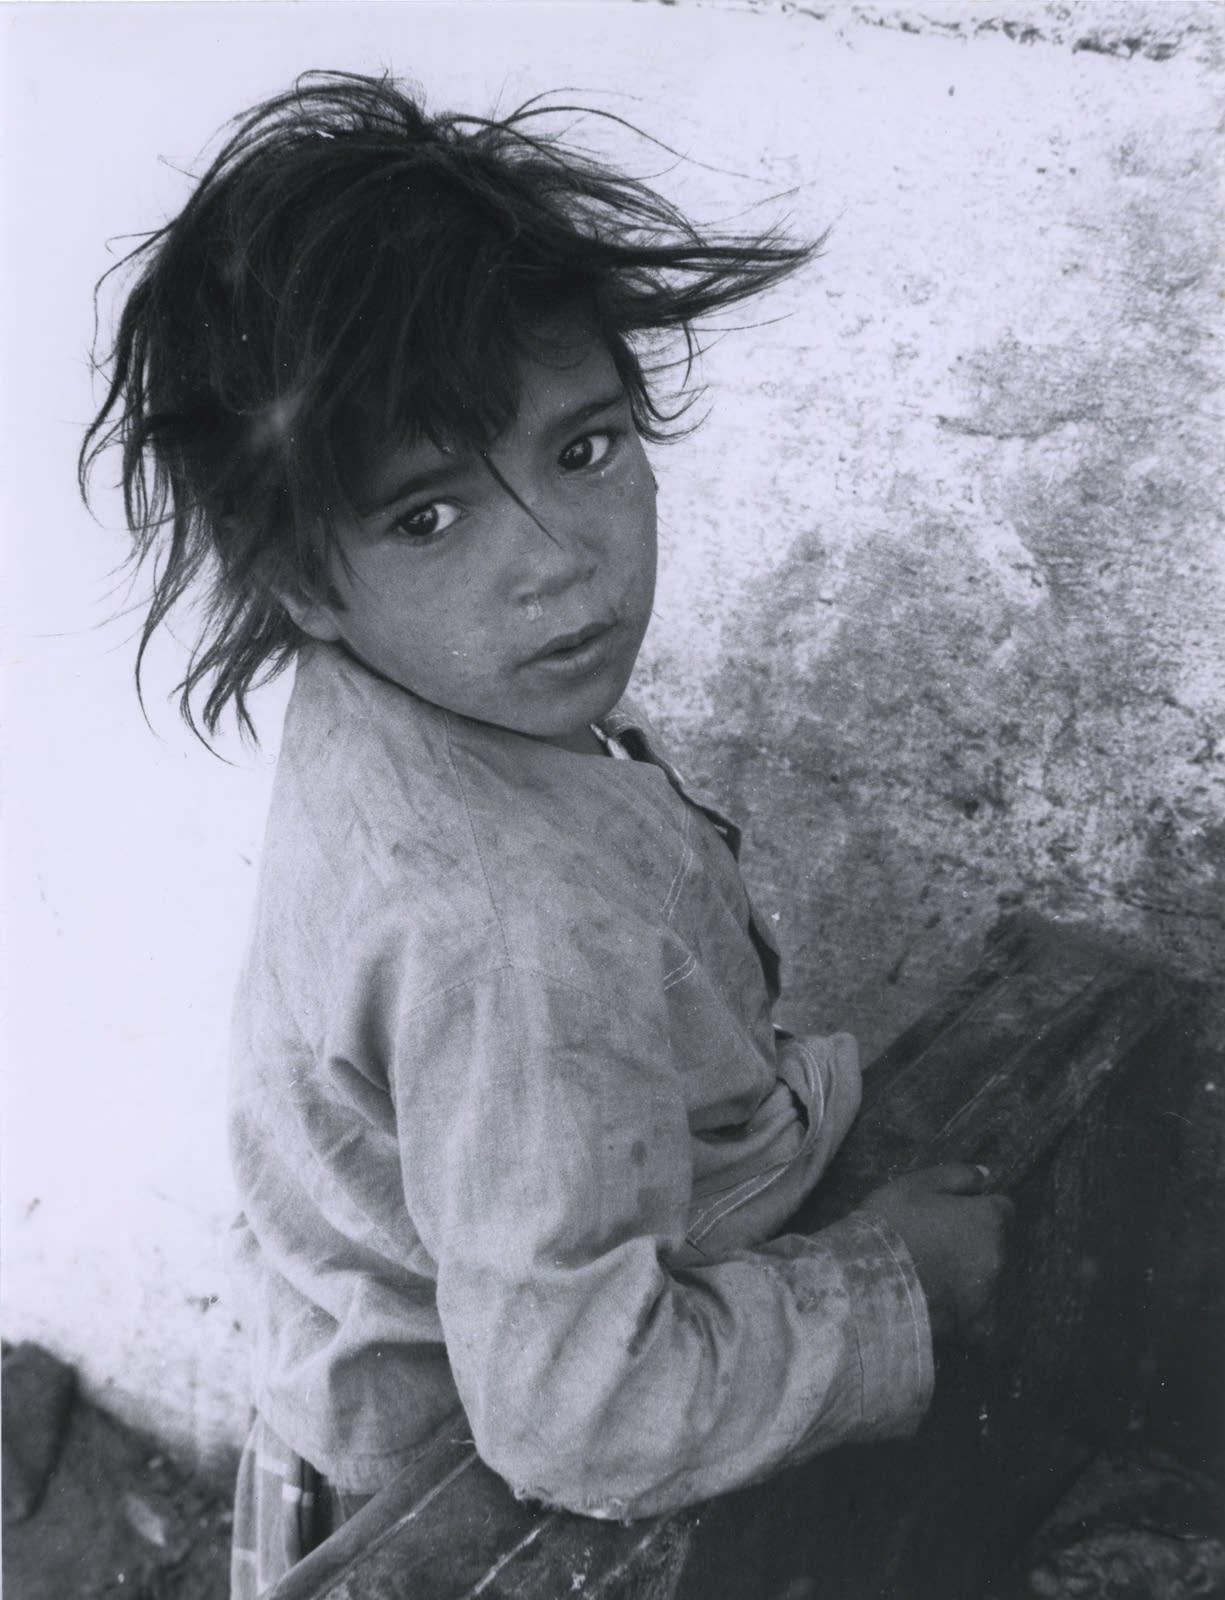 Sabine Weiss, Les Saintes-Maries-de-la-mer, 1960